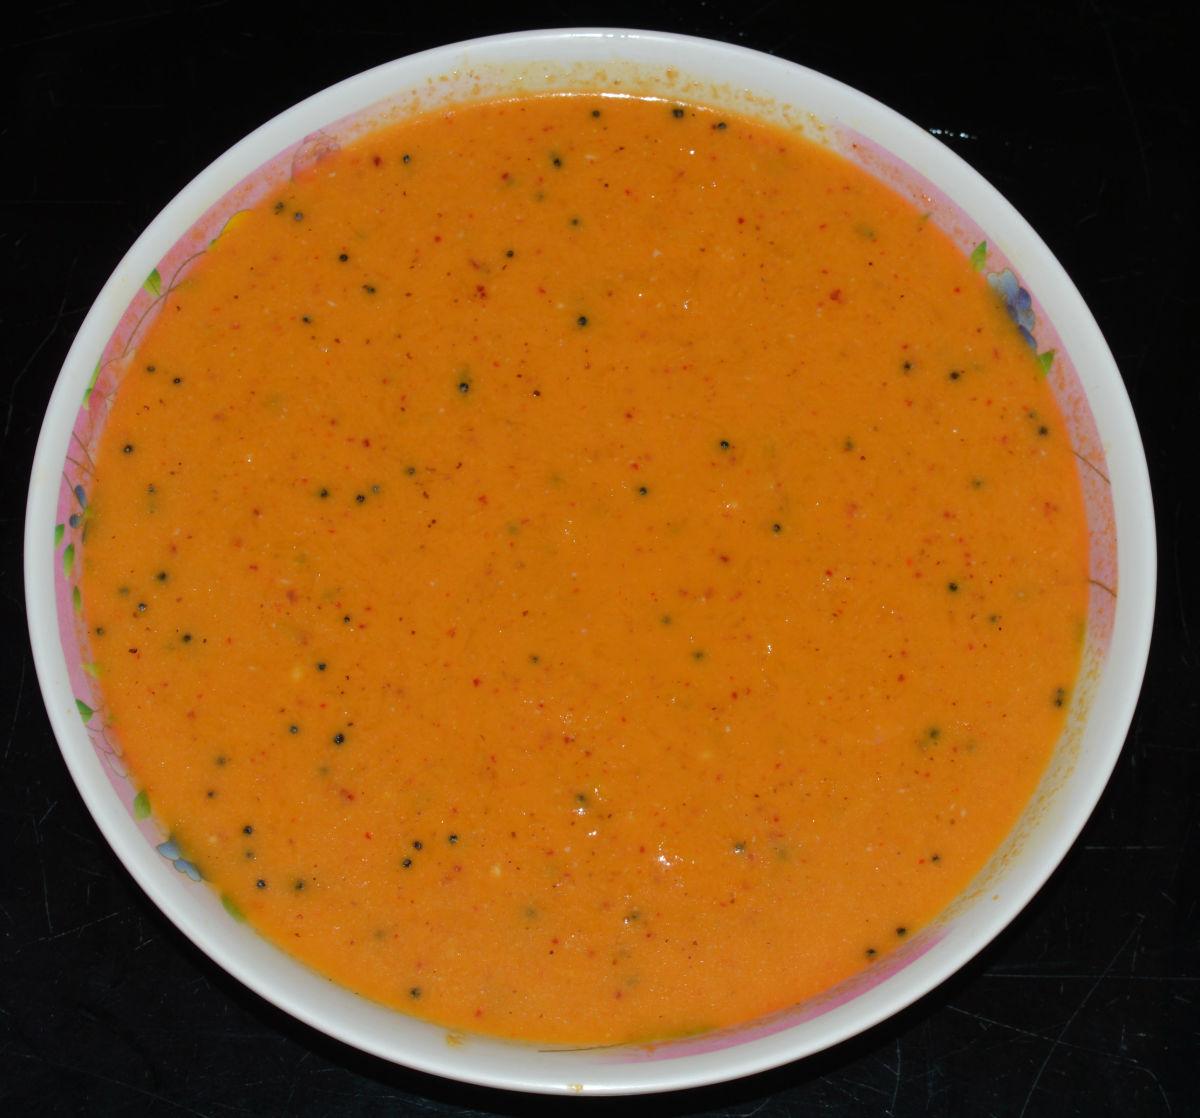 Serve the raita with plain rice, dosa, chapati, or flatbread. Enjoy eating the combo!